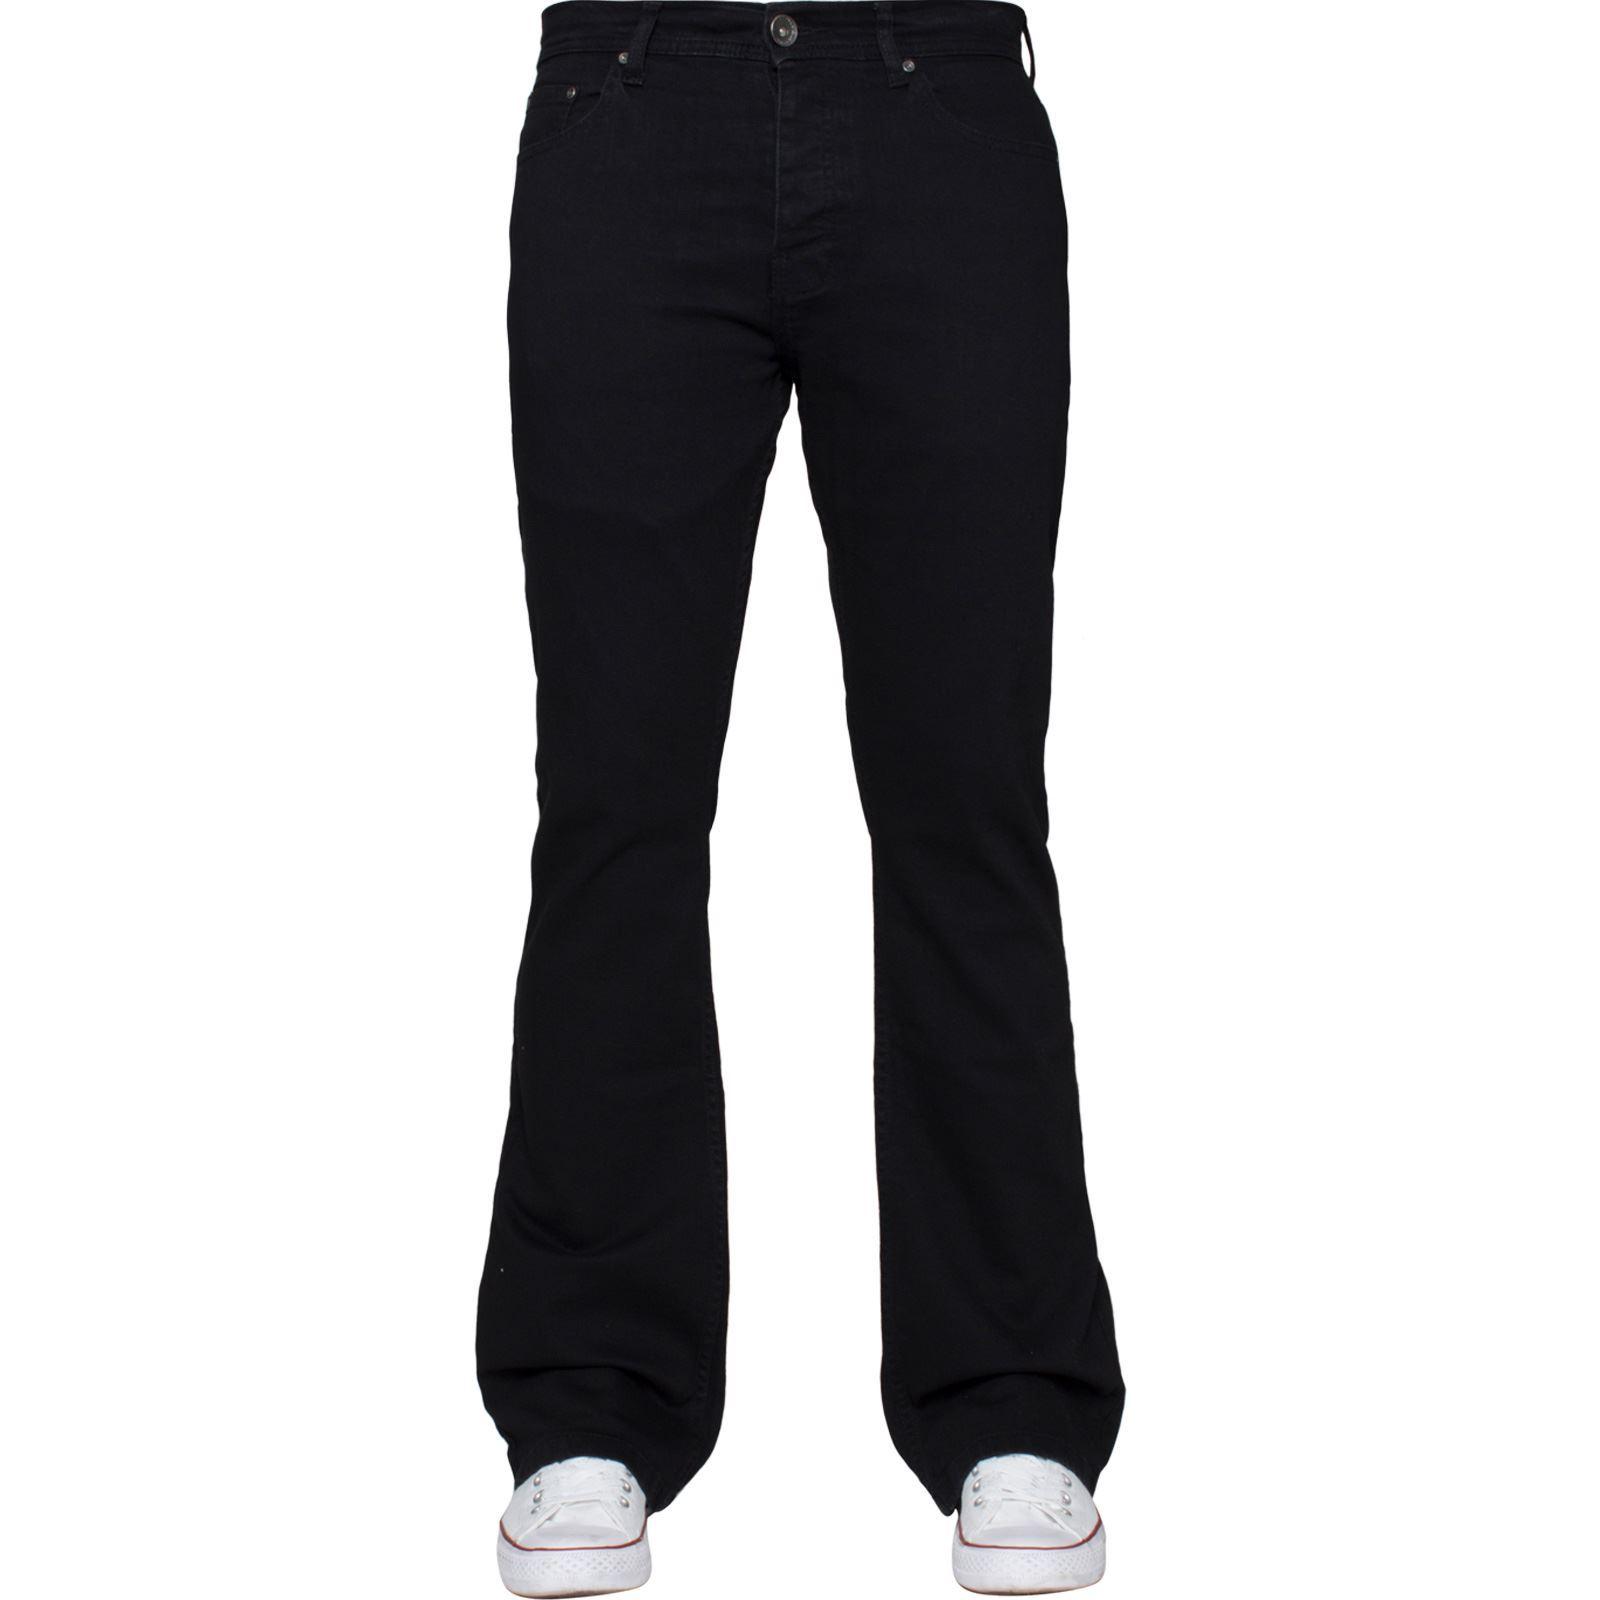 Para-Hombre-Pierna-Recta-Bootcut-Stretch-Denim-Regulares-Pantalon-de-trabajo-Kruze-Todas-Cinturas miniatura 68